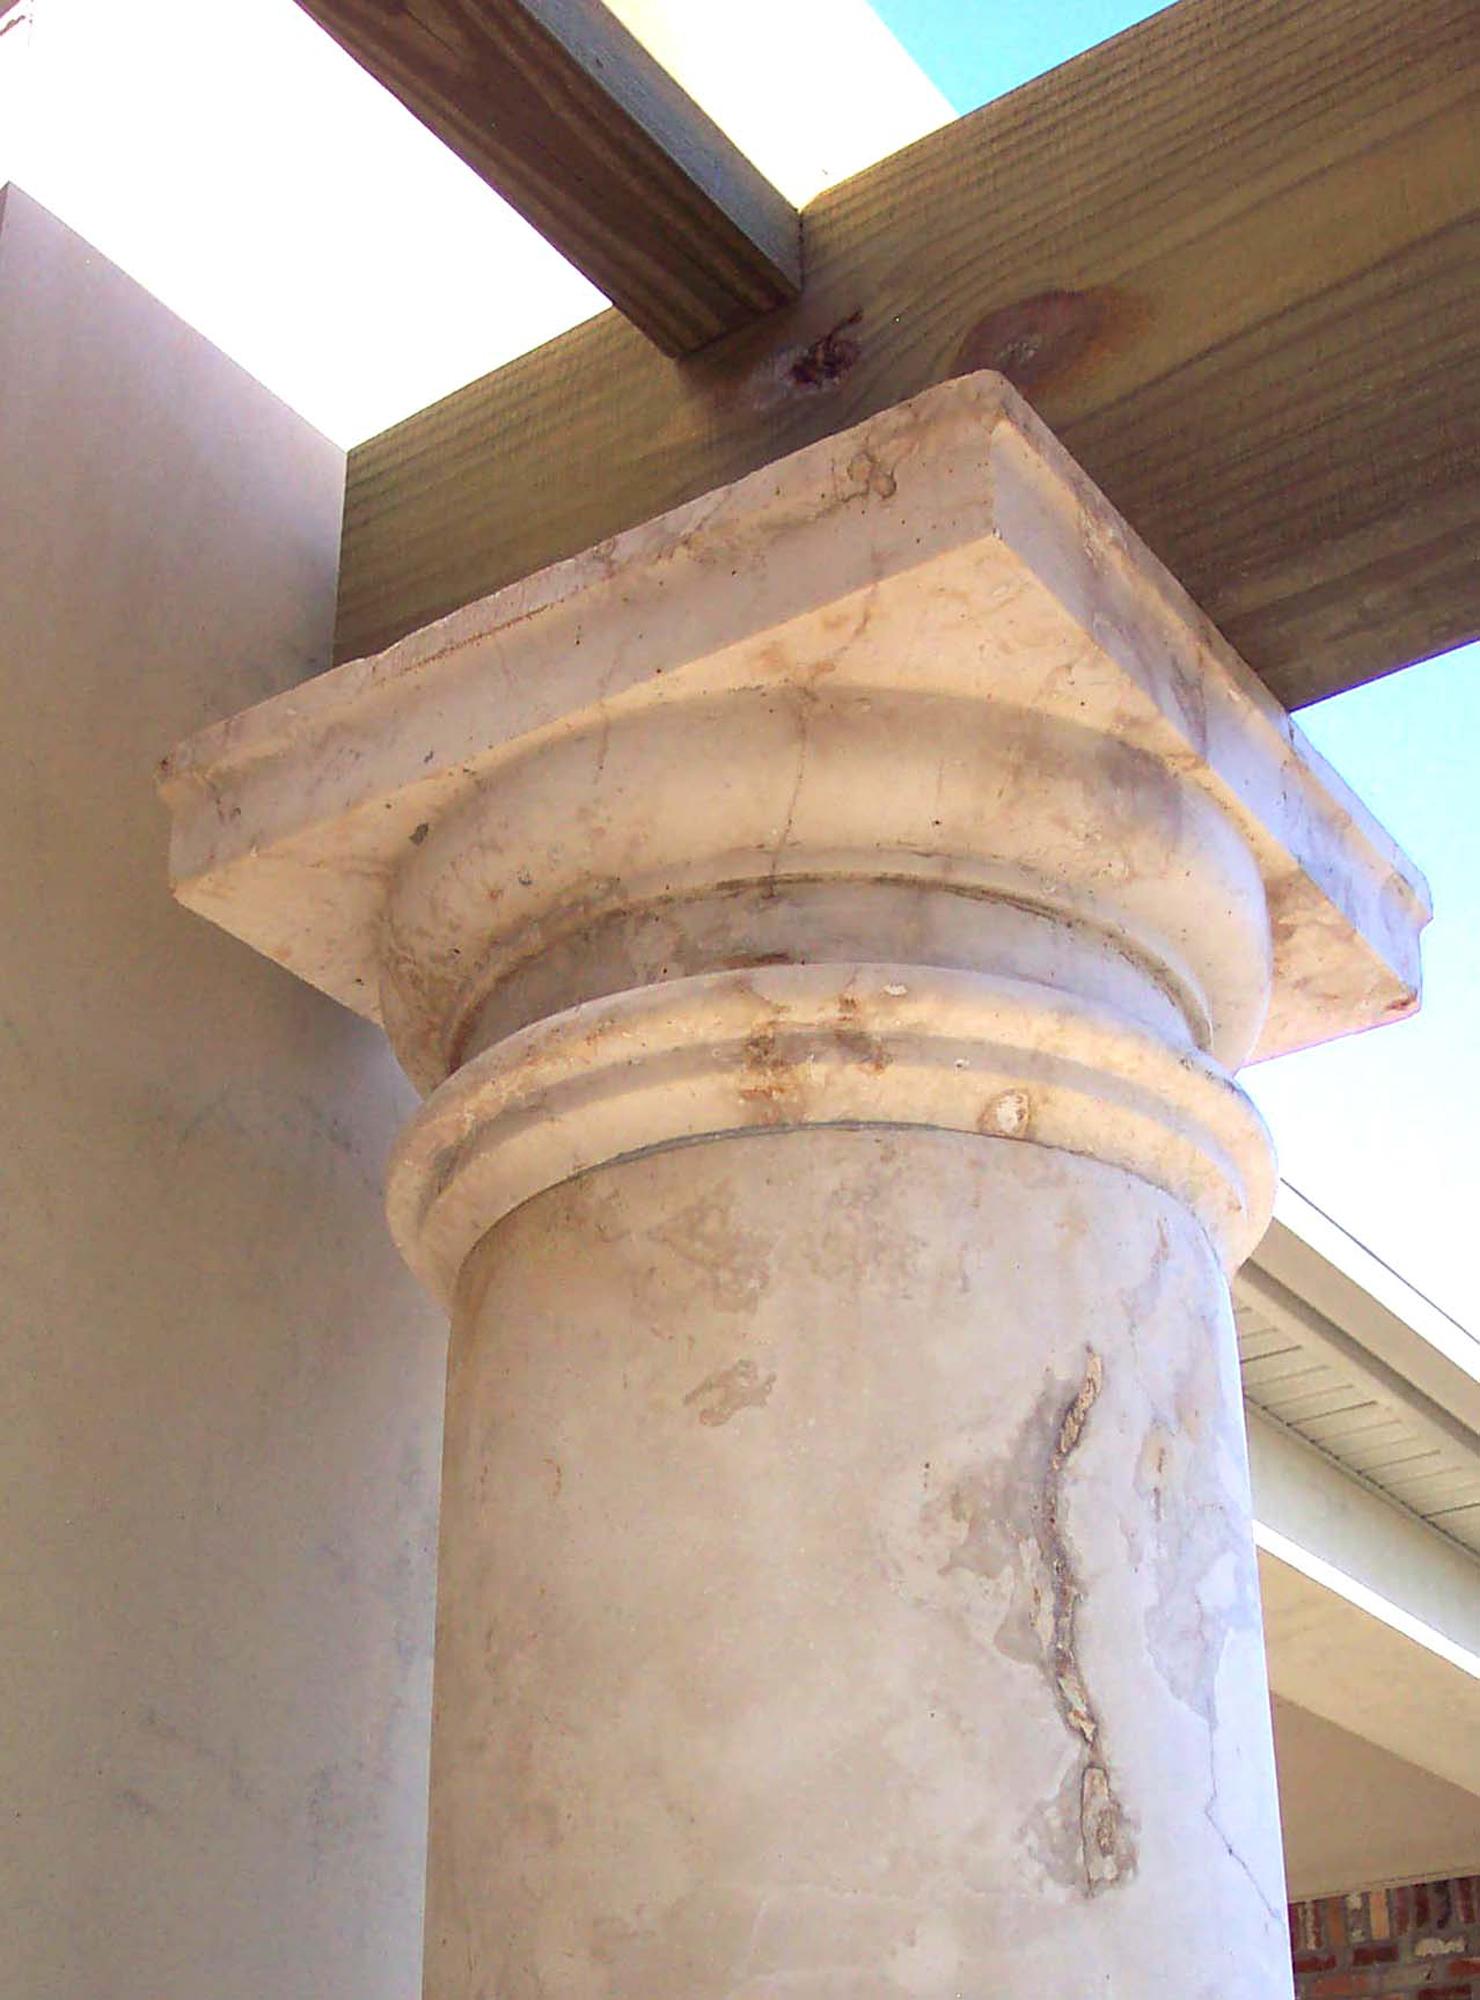 Column capital_Tuscan_closeup_Price_1480x2000_DCP_5430 cropped 2.jpg